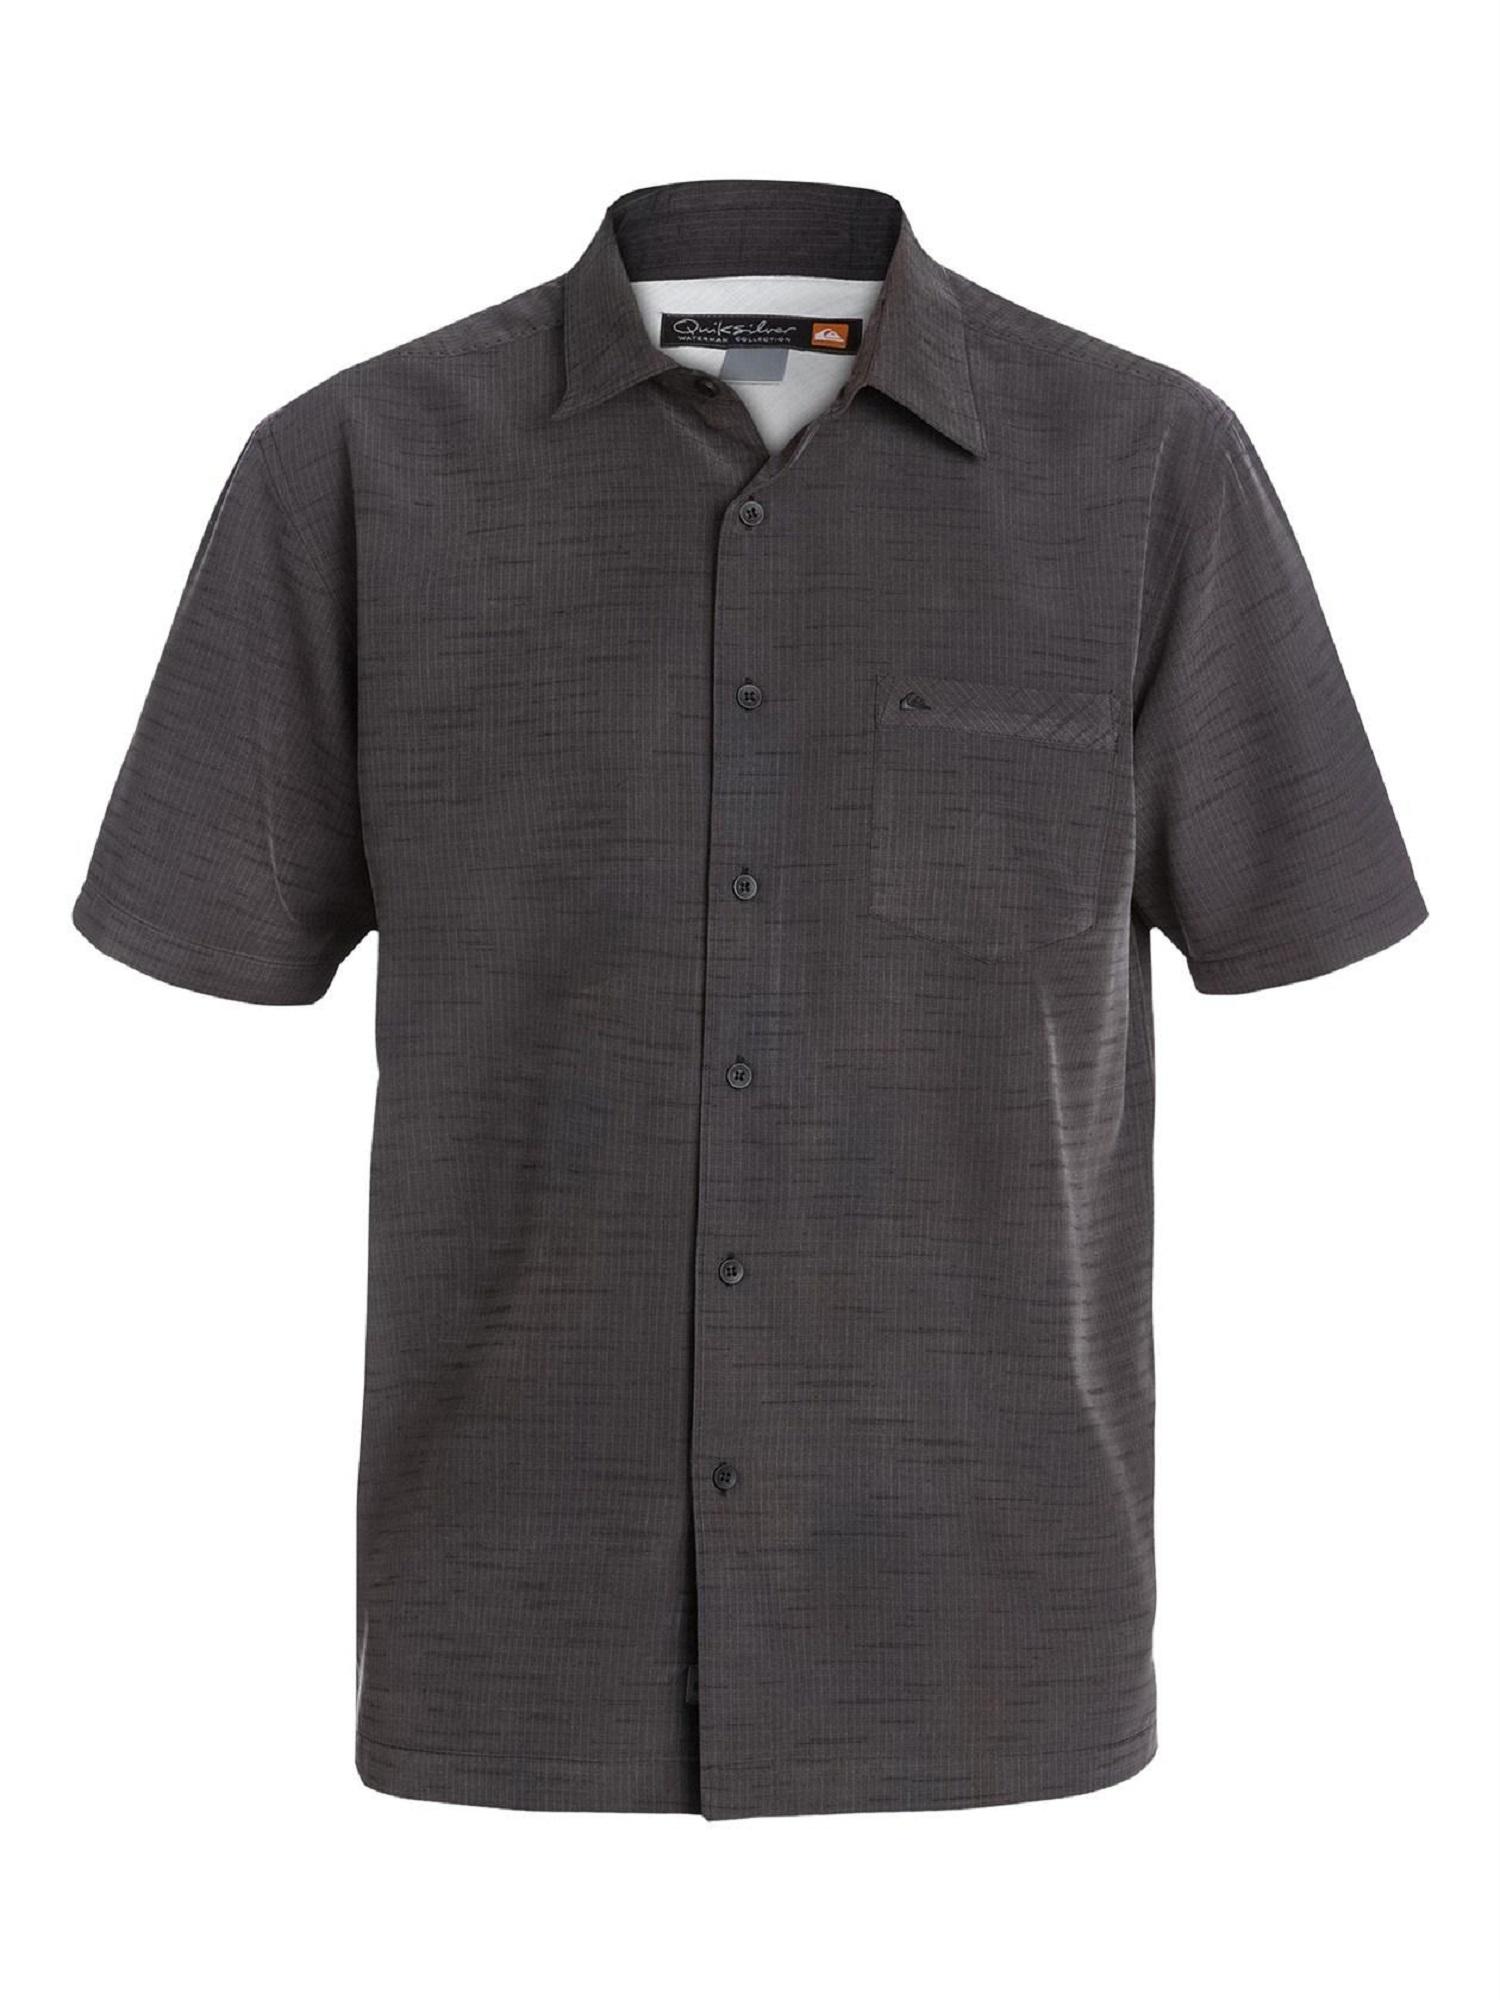 Quiksilver  Centinela 4 Shirt